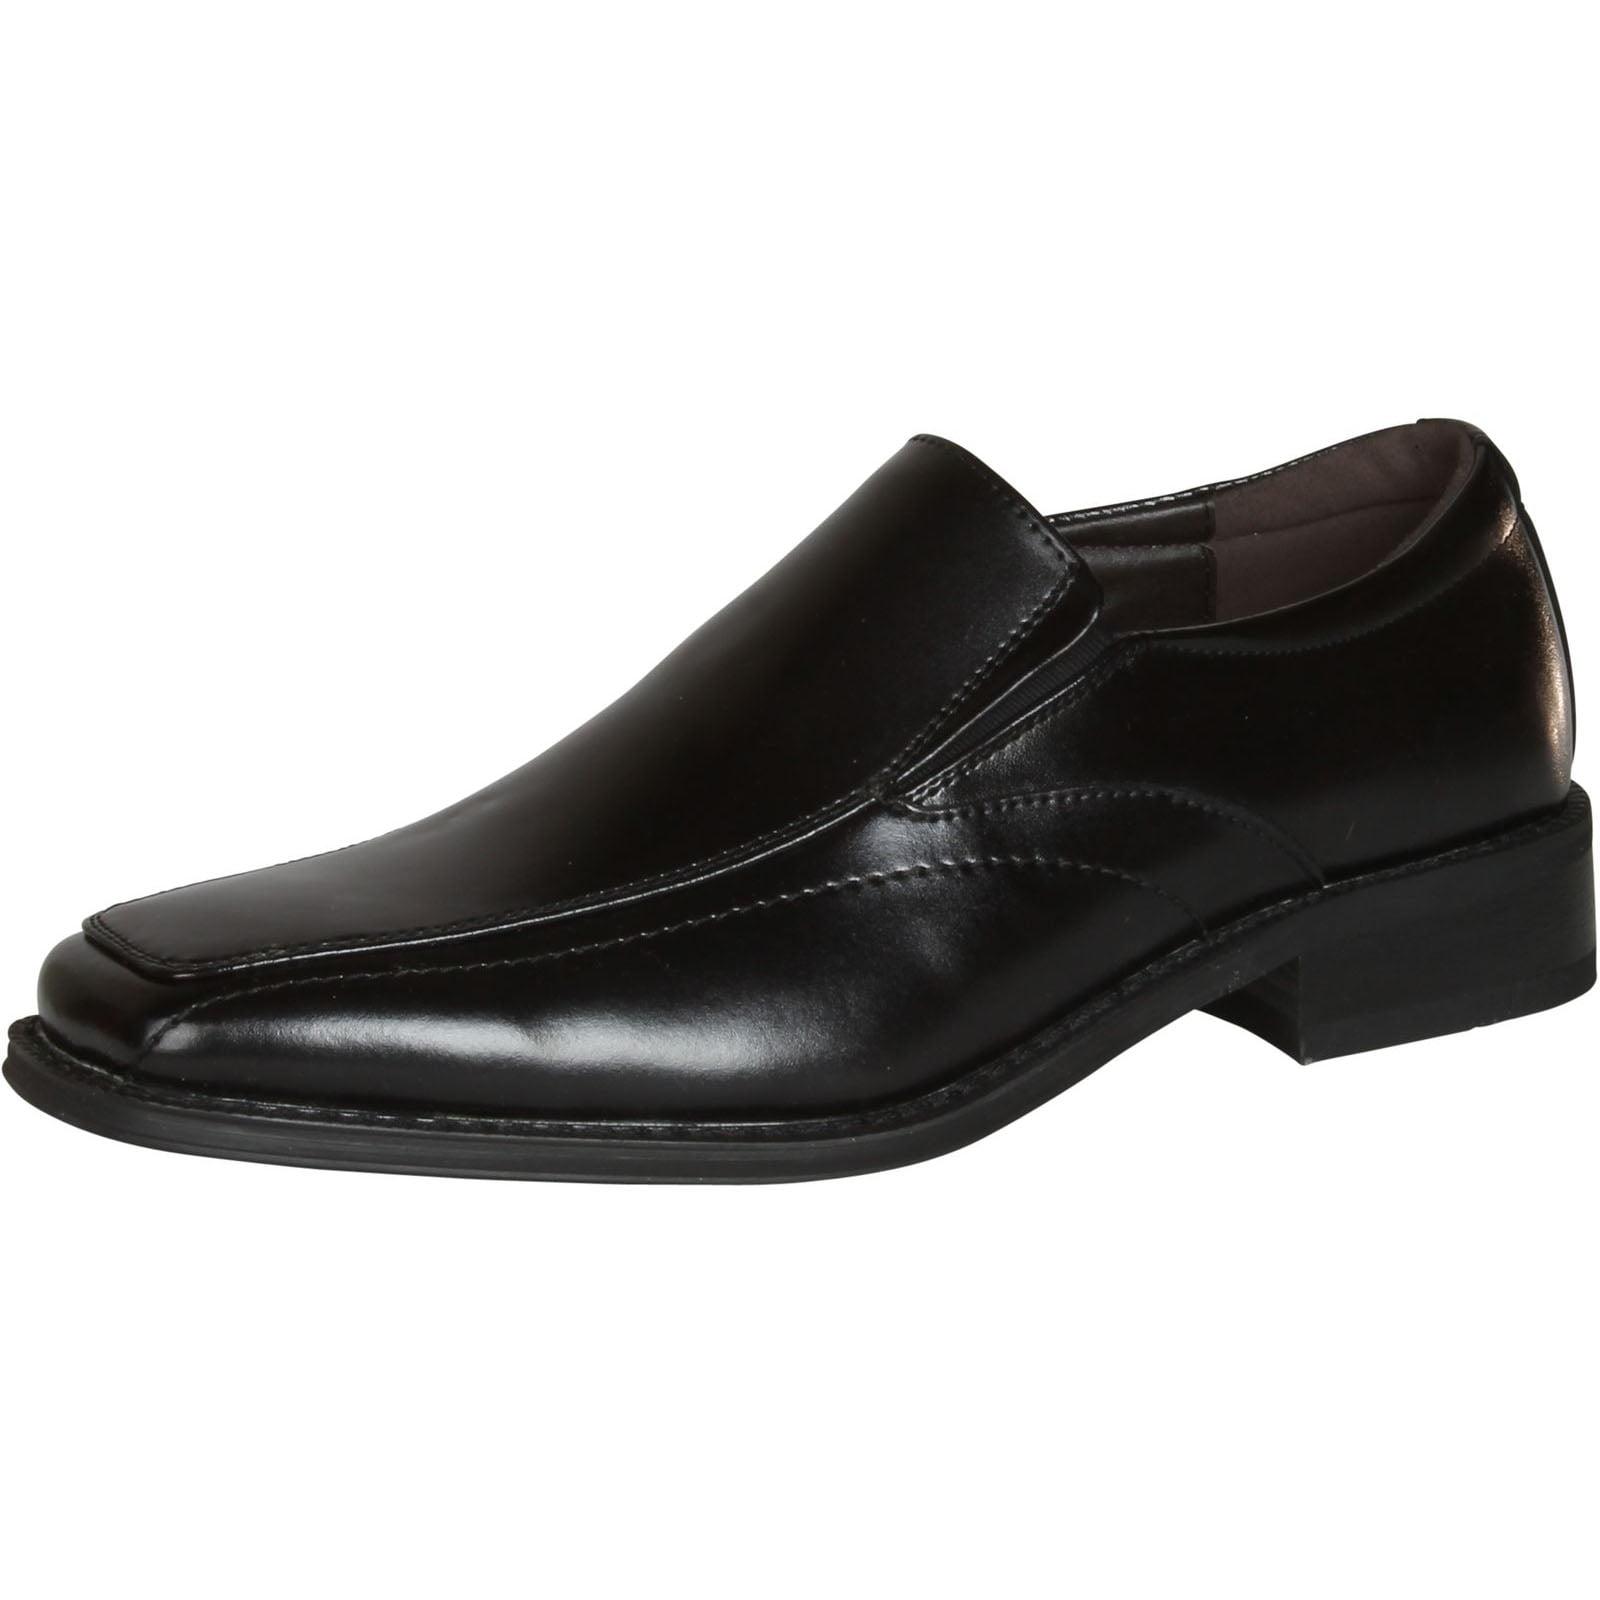 Giorgio Brutini Men's Slip On Loafers Shoes by Giorgio Brutini